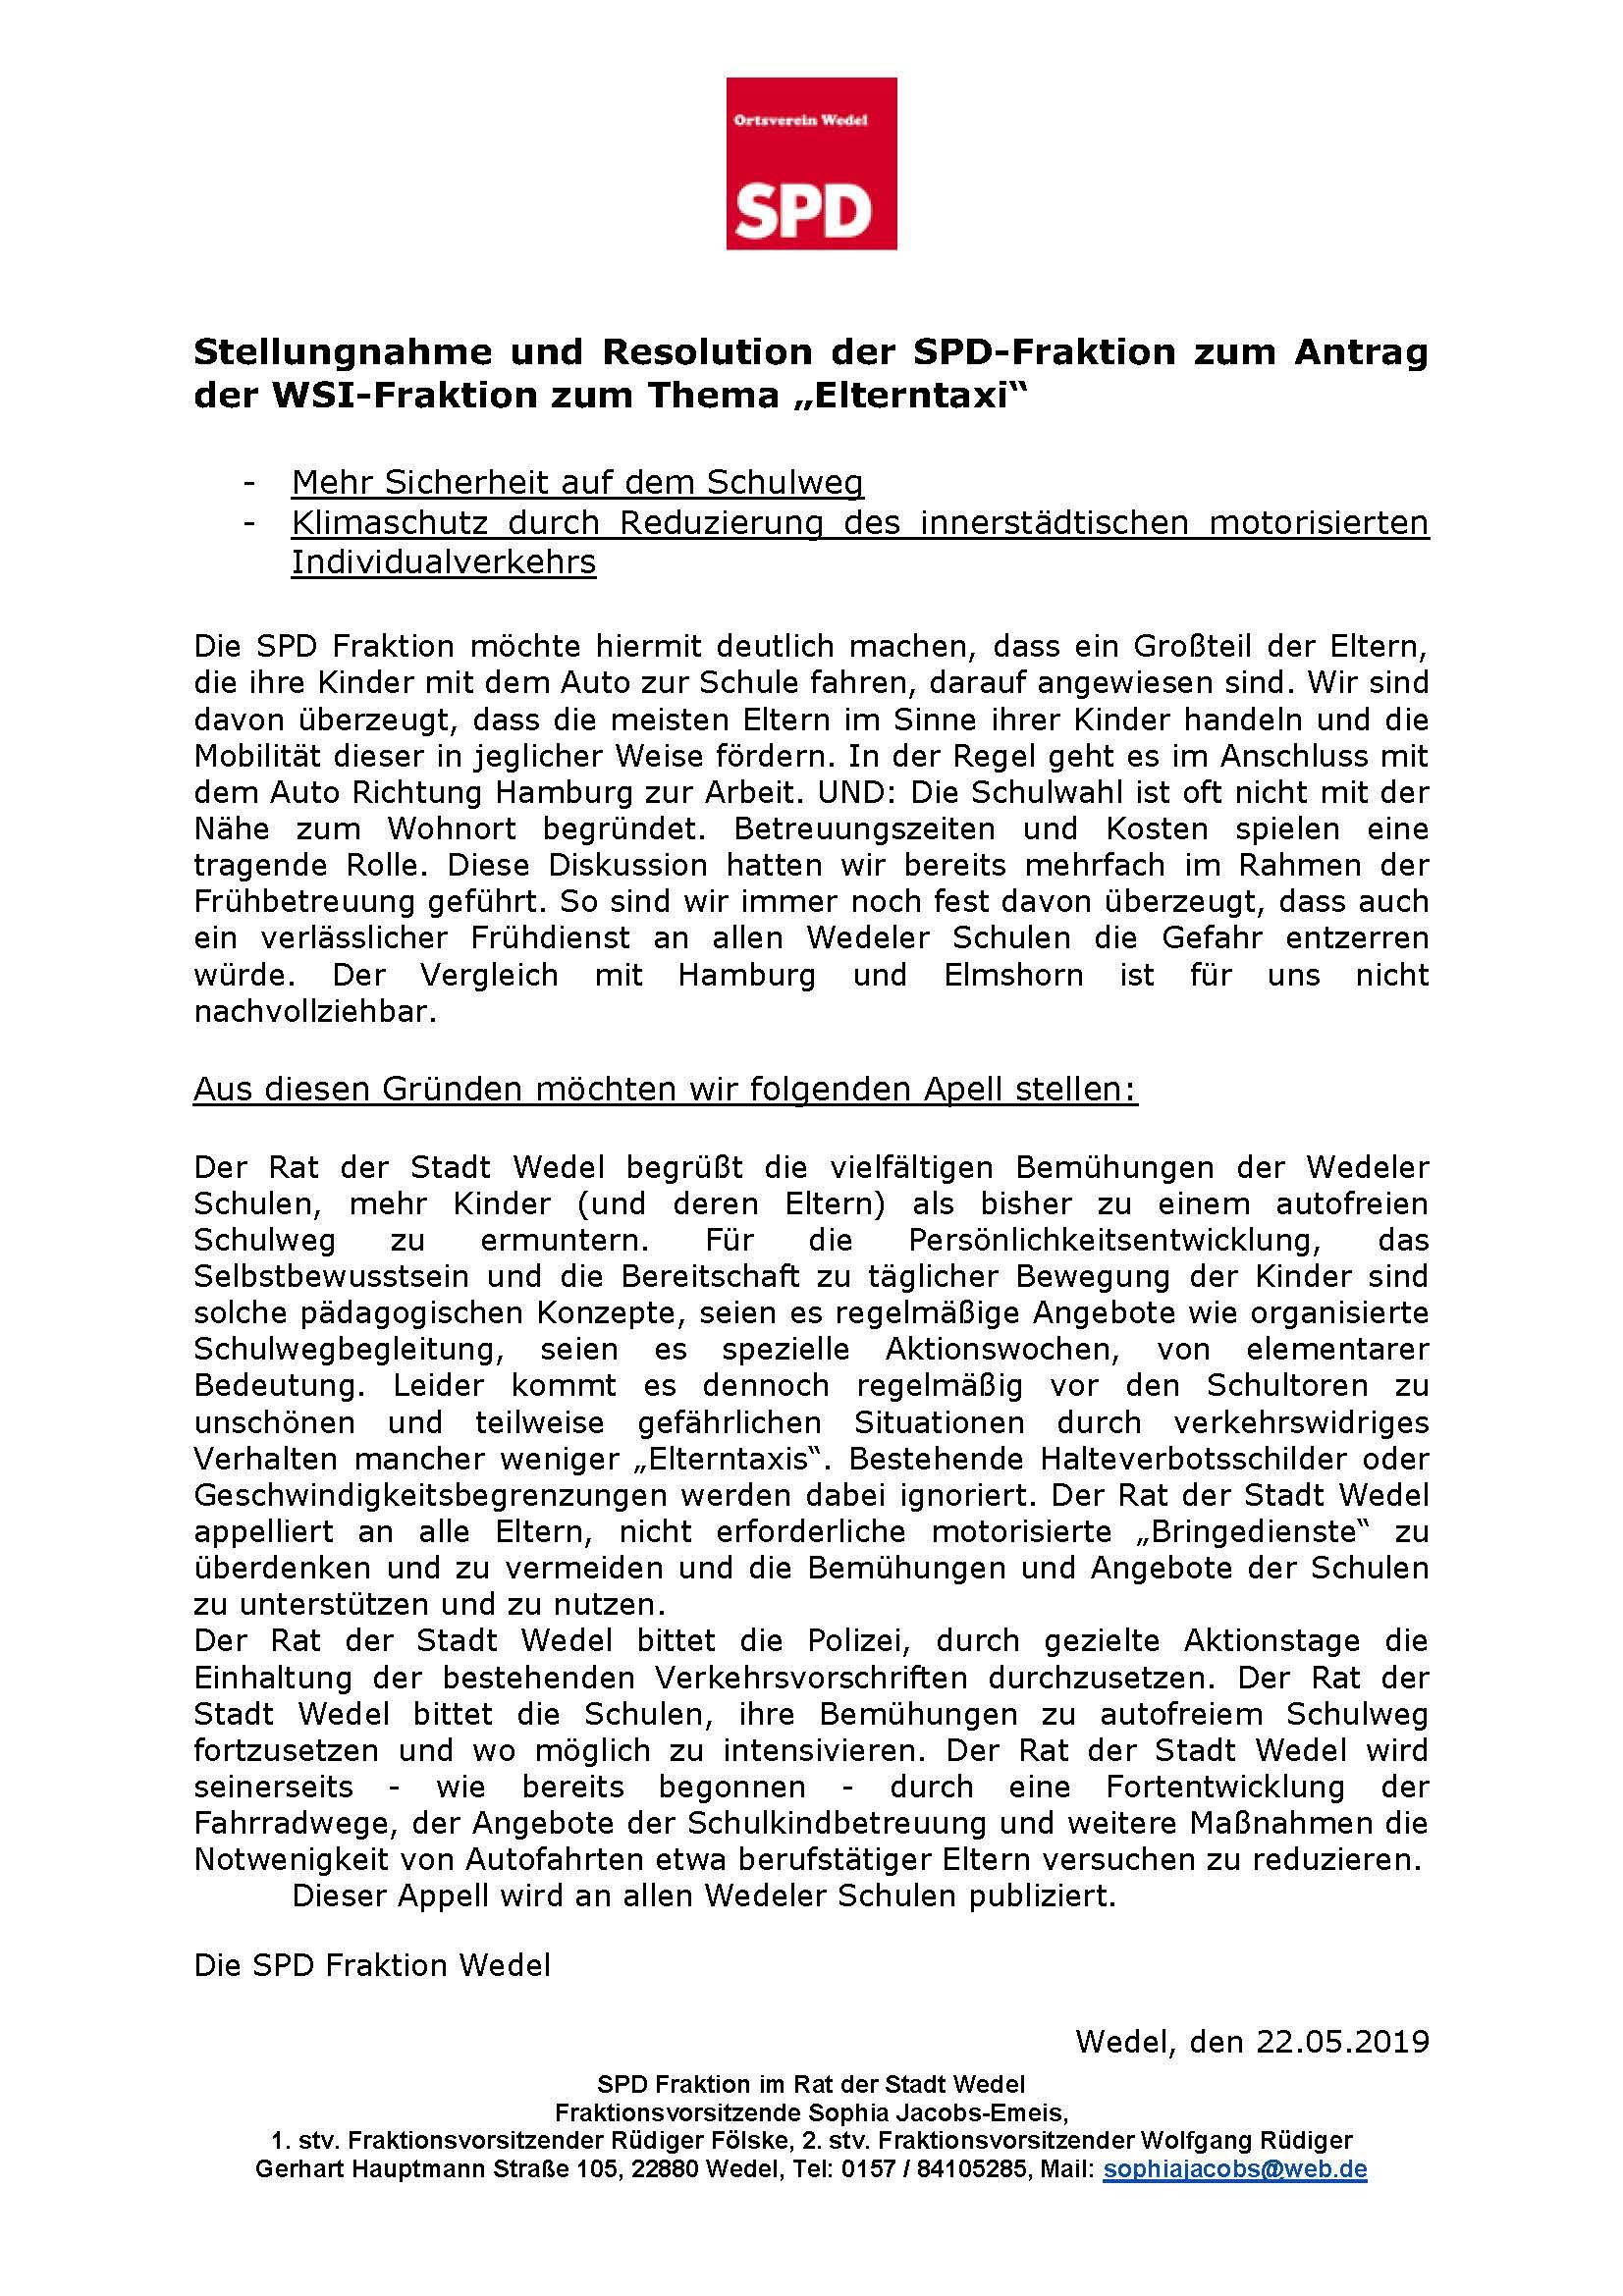 Antrag_Stellungnahme_Antrag_WSI_Appell_Rat_21_5_19.jpg